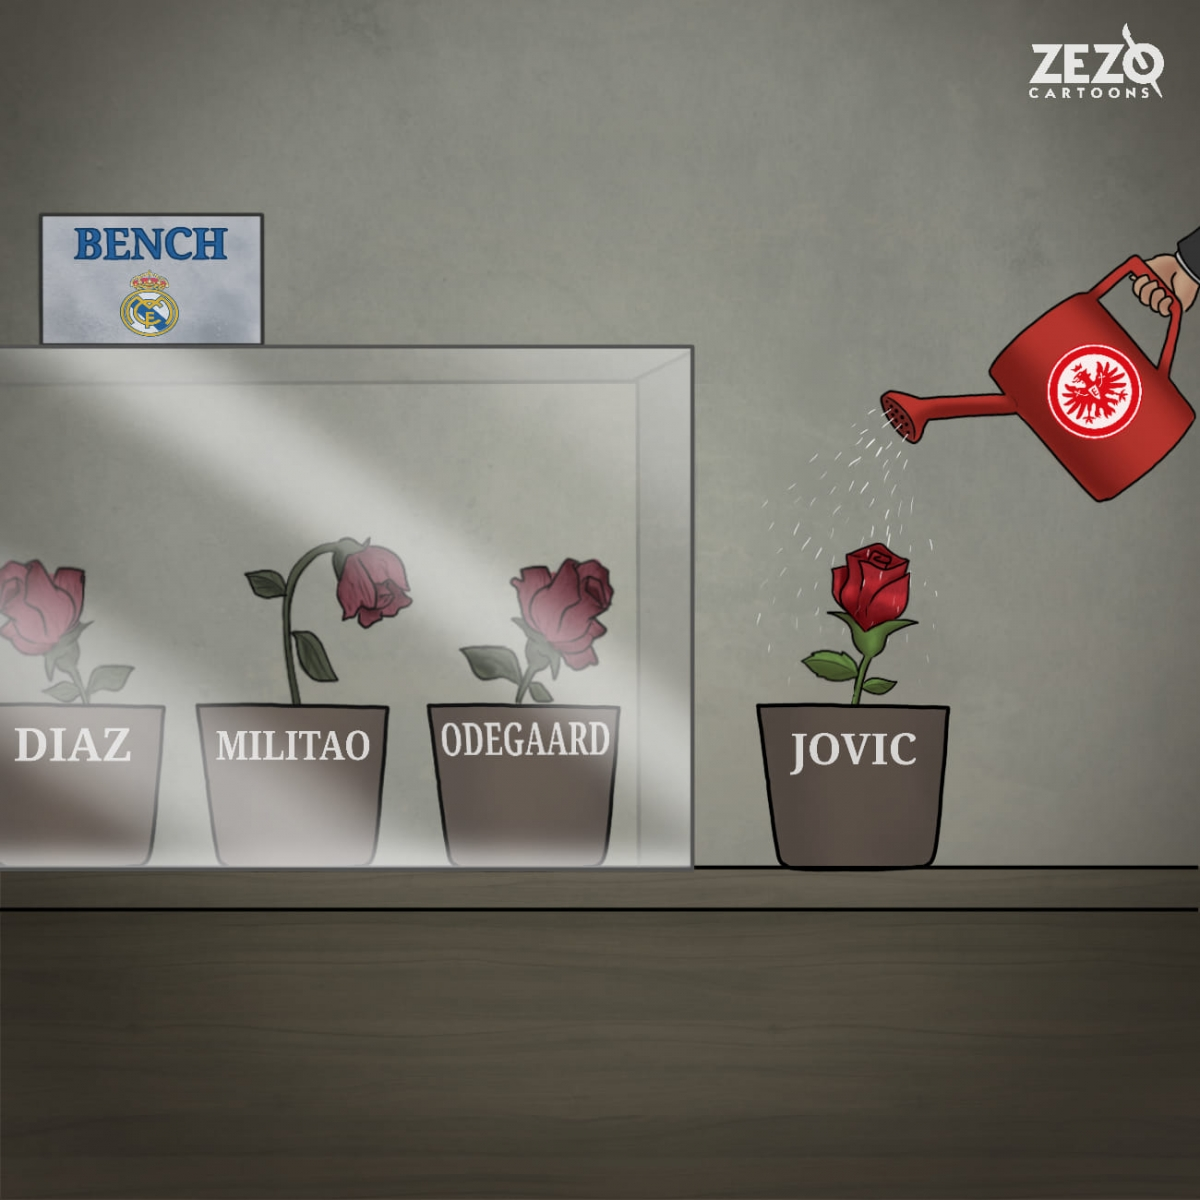 Luka Jovic hồi sinh sau khi rời Real Madrid. (Ảnh: ZEZO Cartoons)